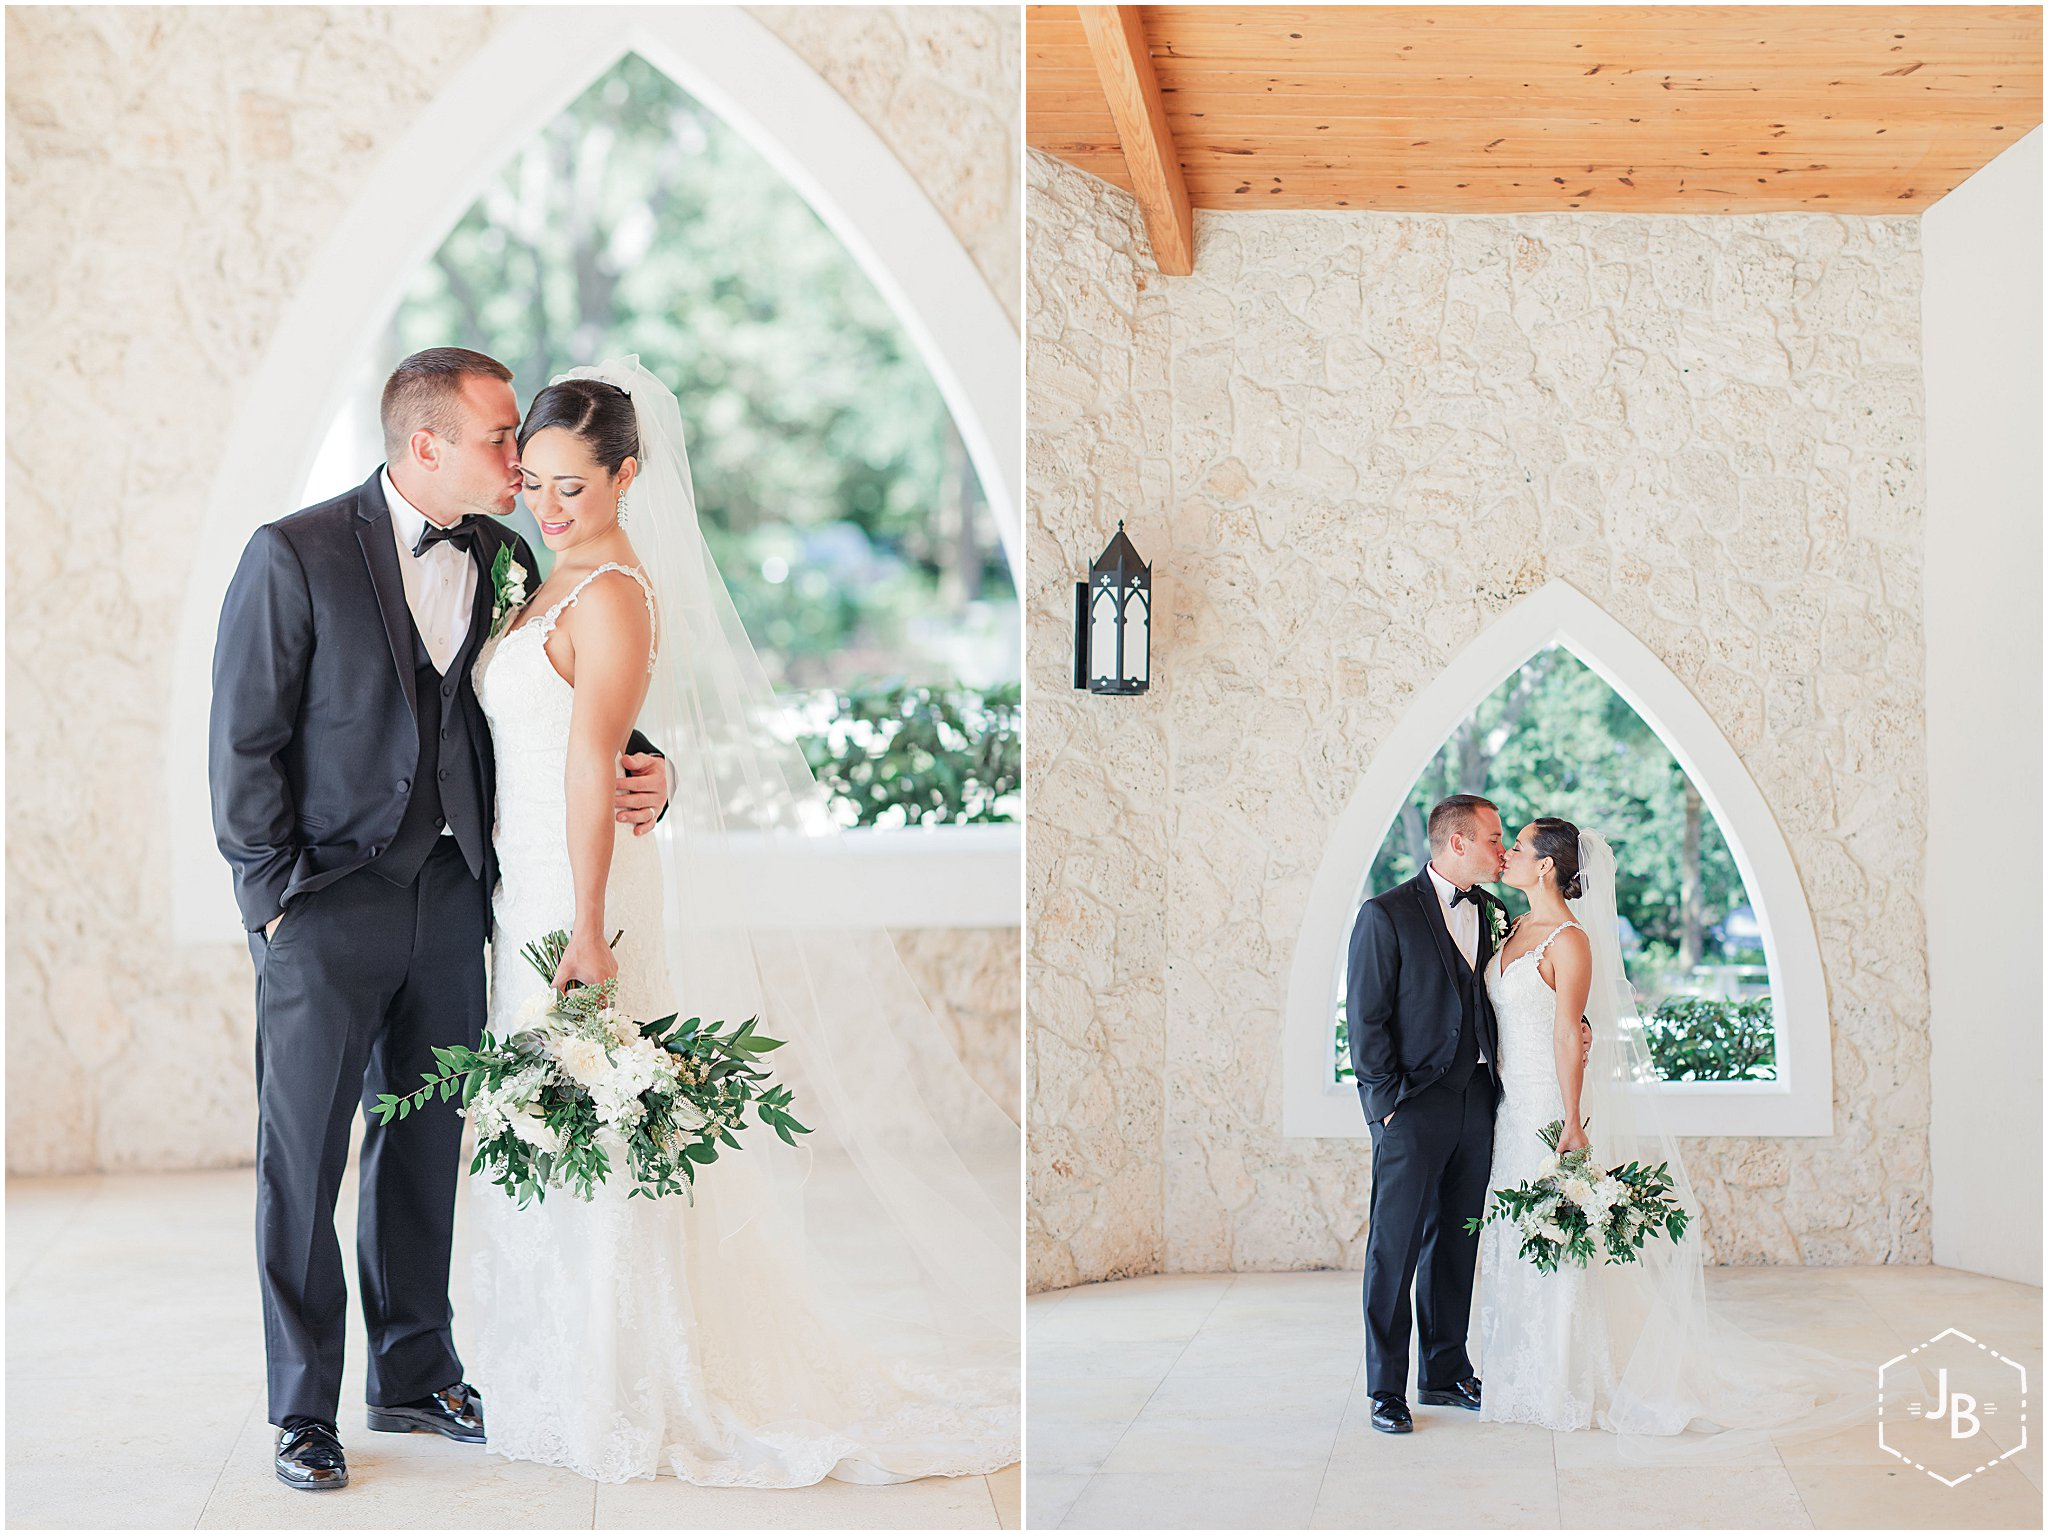 WeddingandEngagementFloridaPhotographer_0218.jpg